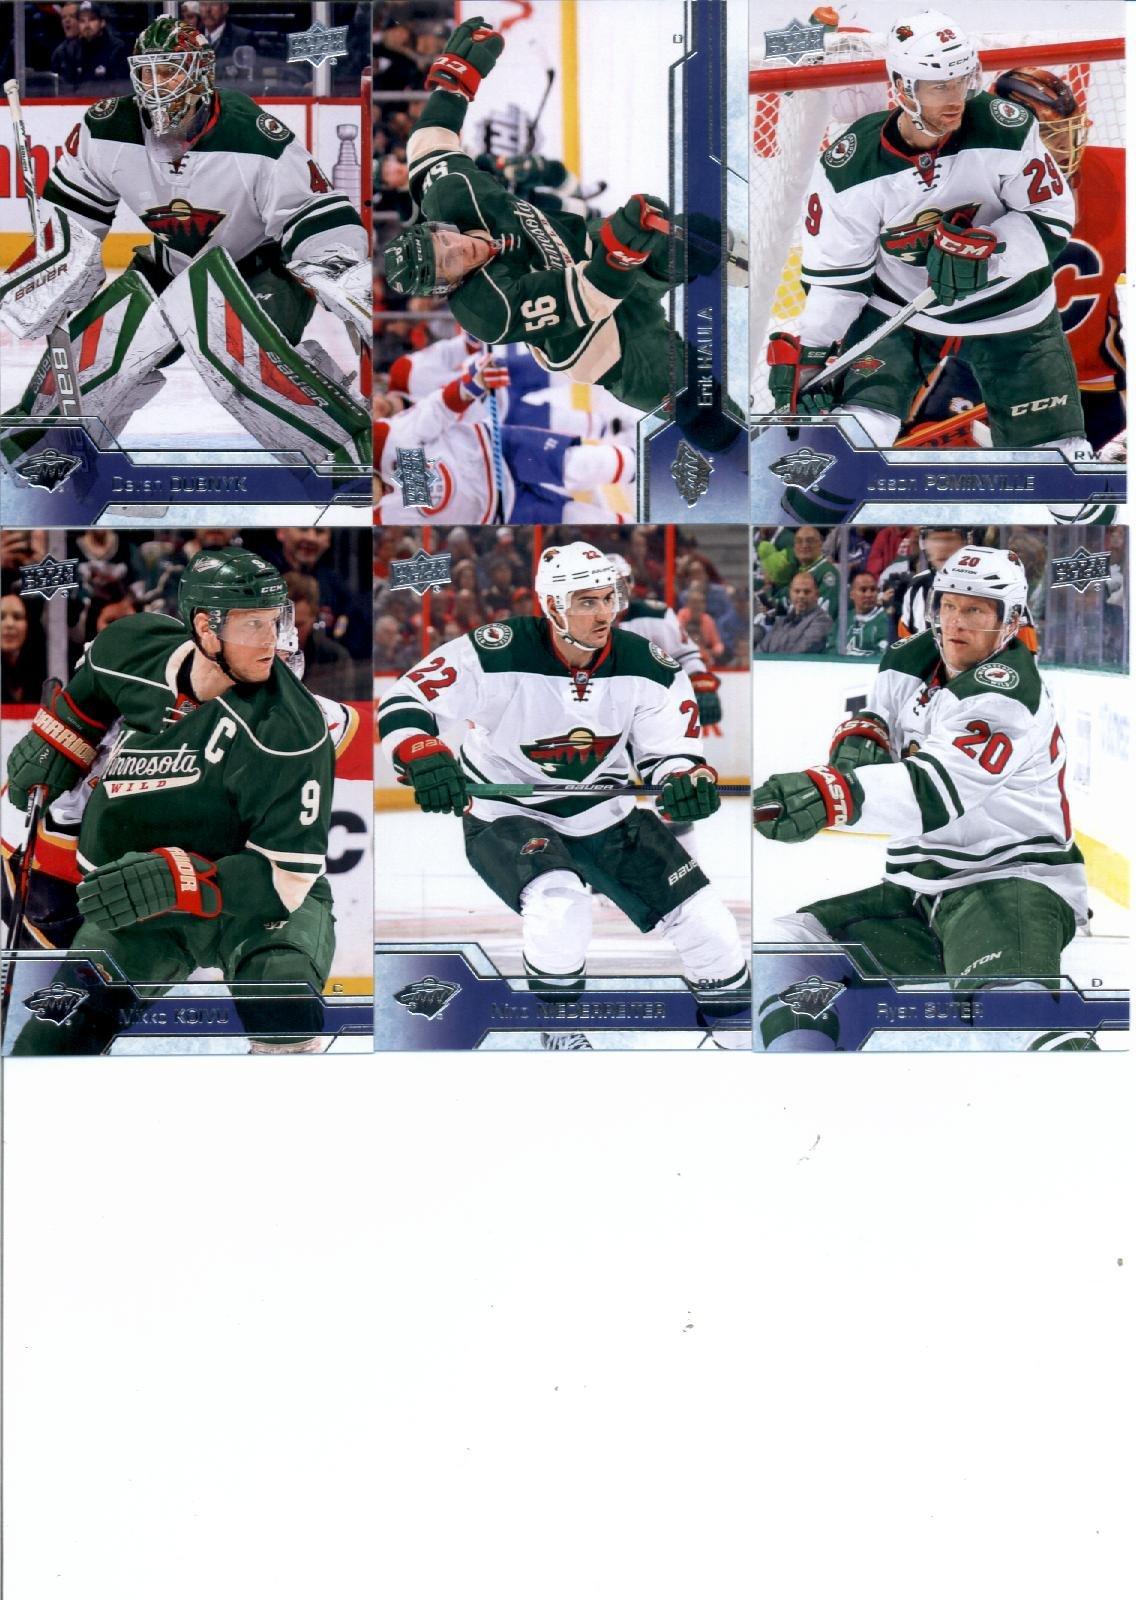 2016-17 Upper Deck Series 1 Minnesota Wild Team Set of 6 Cards: Devan Dubnyk(#93), Erik Haula(#94), Jason Pominville(#95), Mikko Koivu(#96), Nino Niederreiter(#97), Ryan Suter(#98)